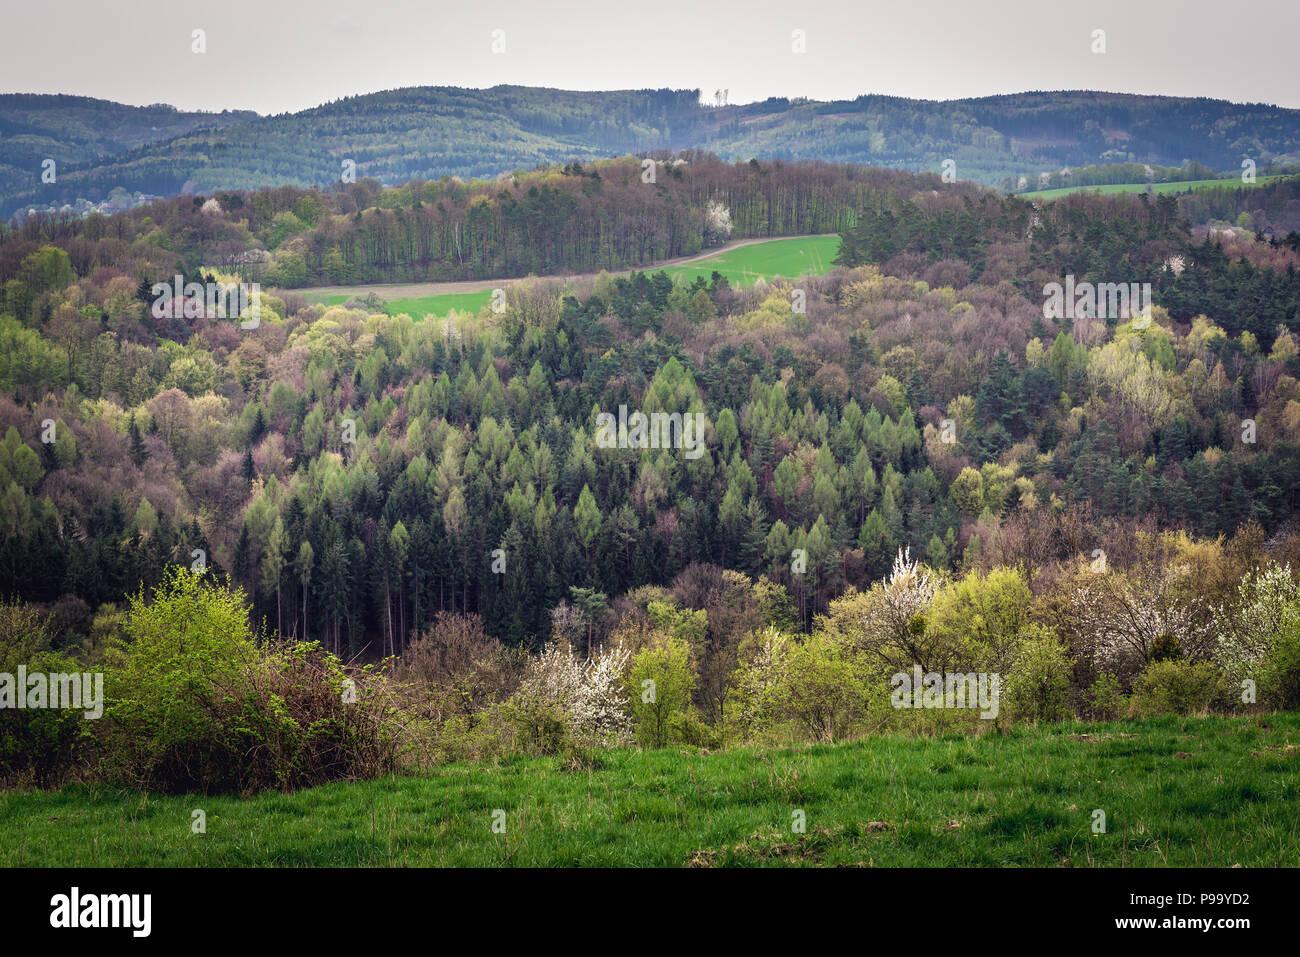 Landscape between Zlin city and Zelechovice nad Deevnici village, Moravia in Czech Republic - Stock Image